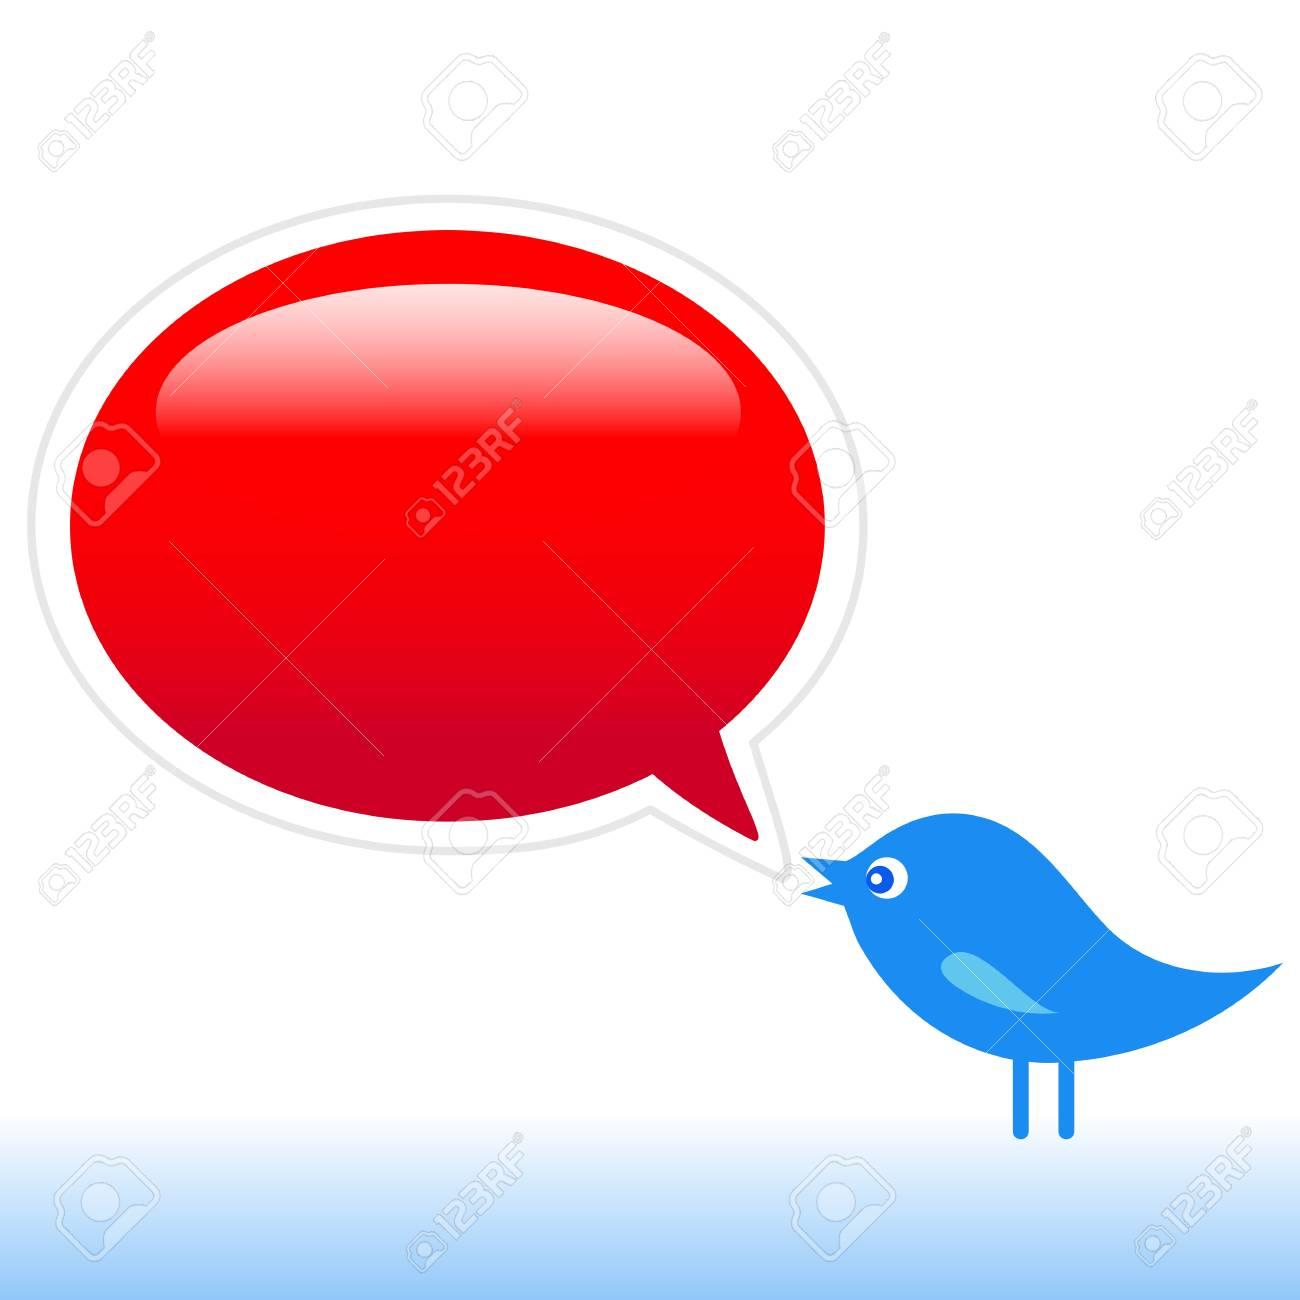 Blue bird with social media icons, illustration Stock Vector - 13632616